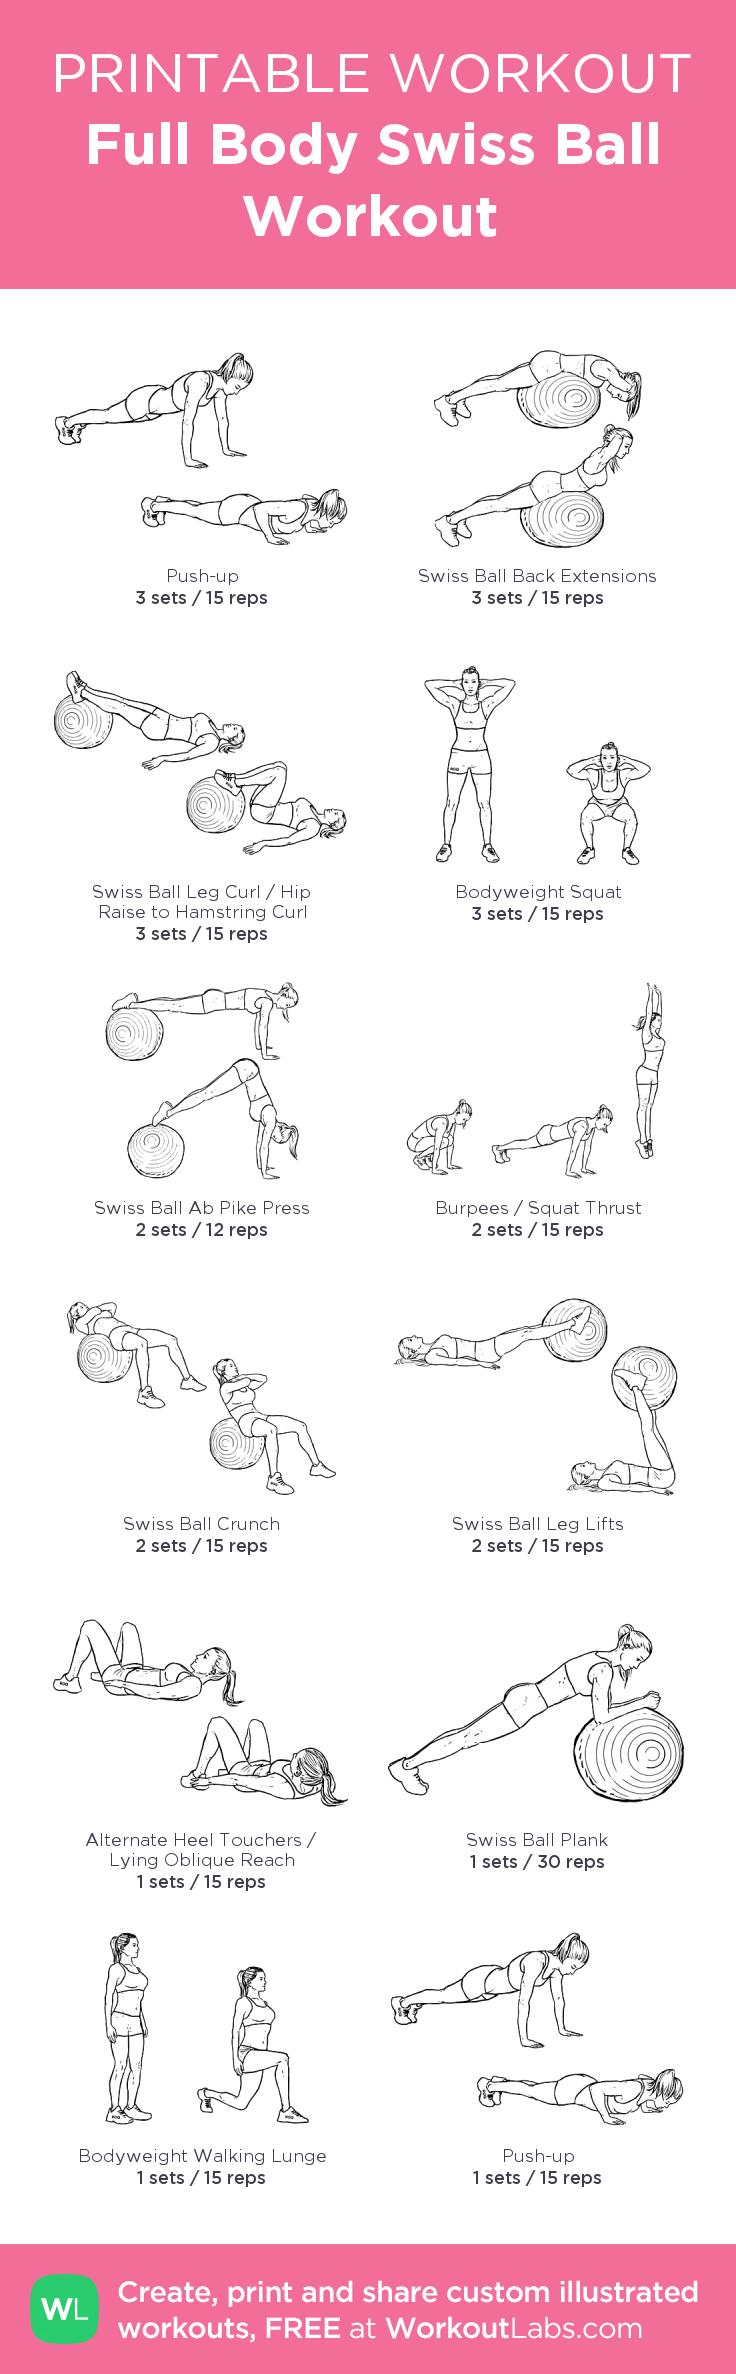 Full Body Swiss Ball Workout · WorkoutLabs Fit